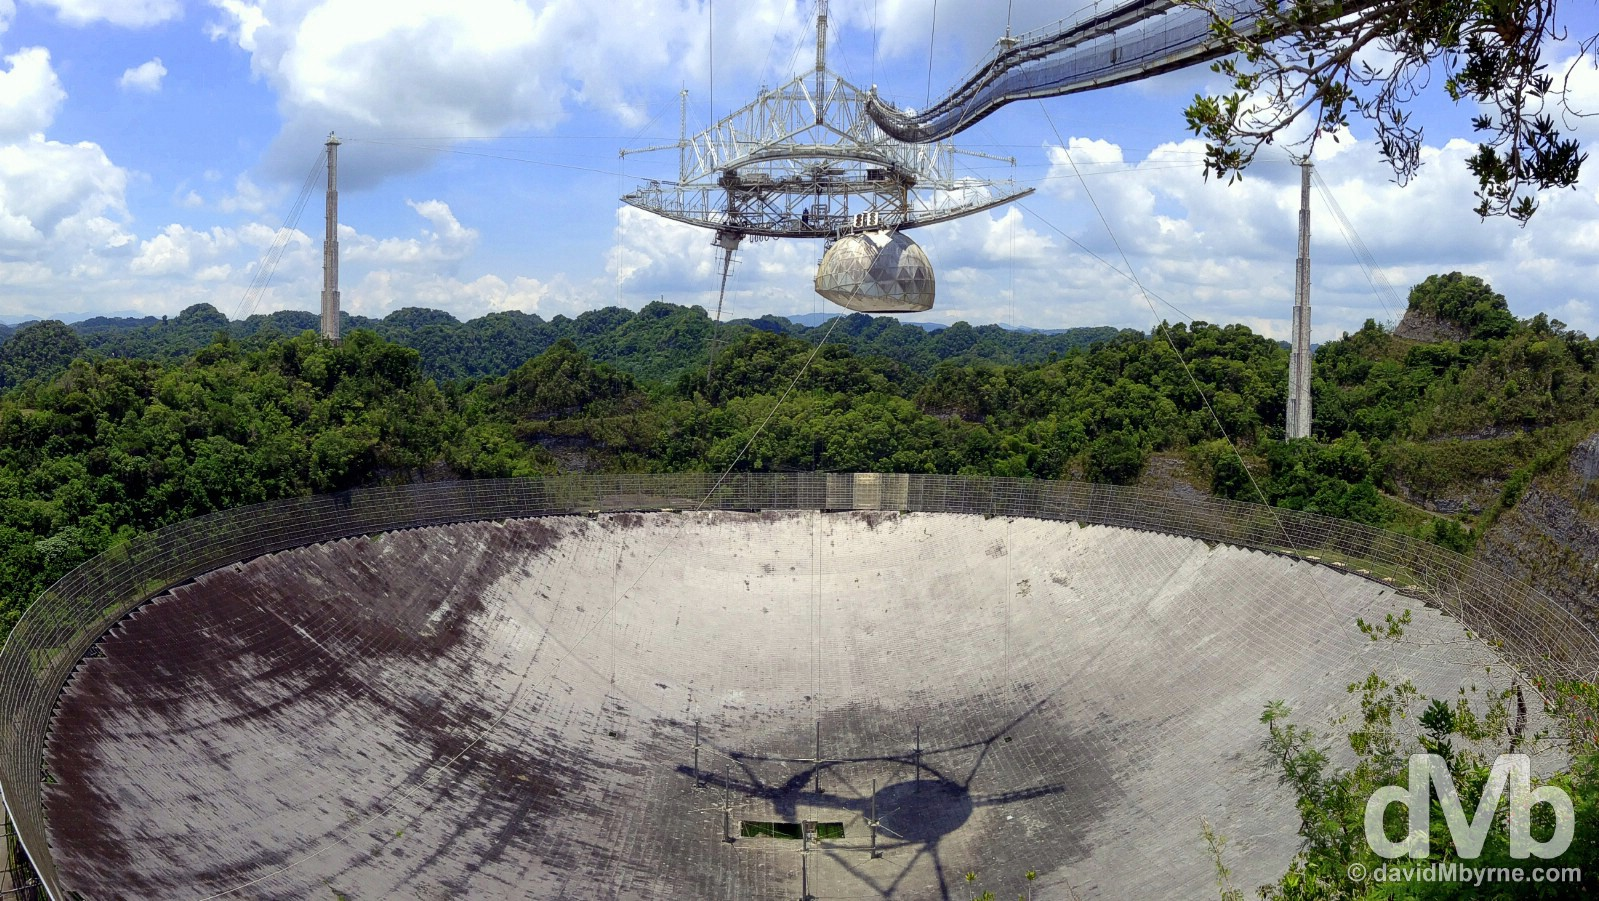 Arecibo Observatory, Puerto Rico, Greater Antilles. June 4, 2015.